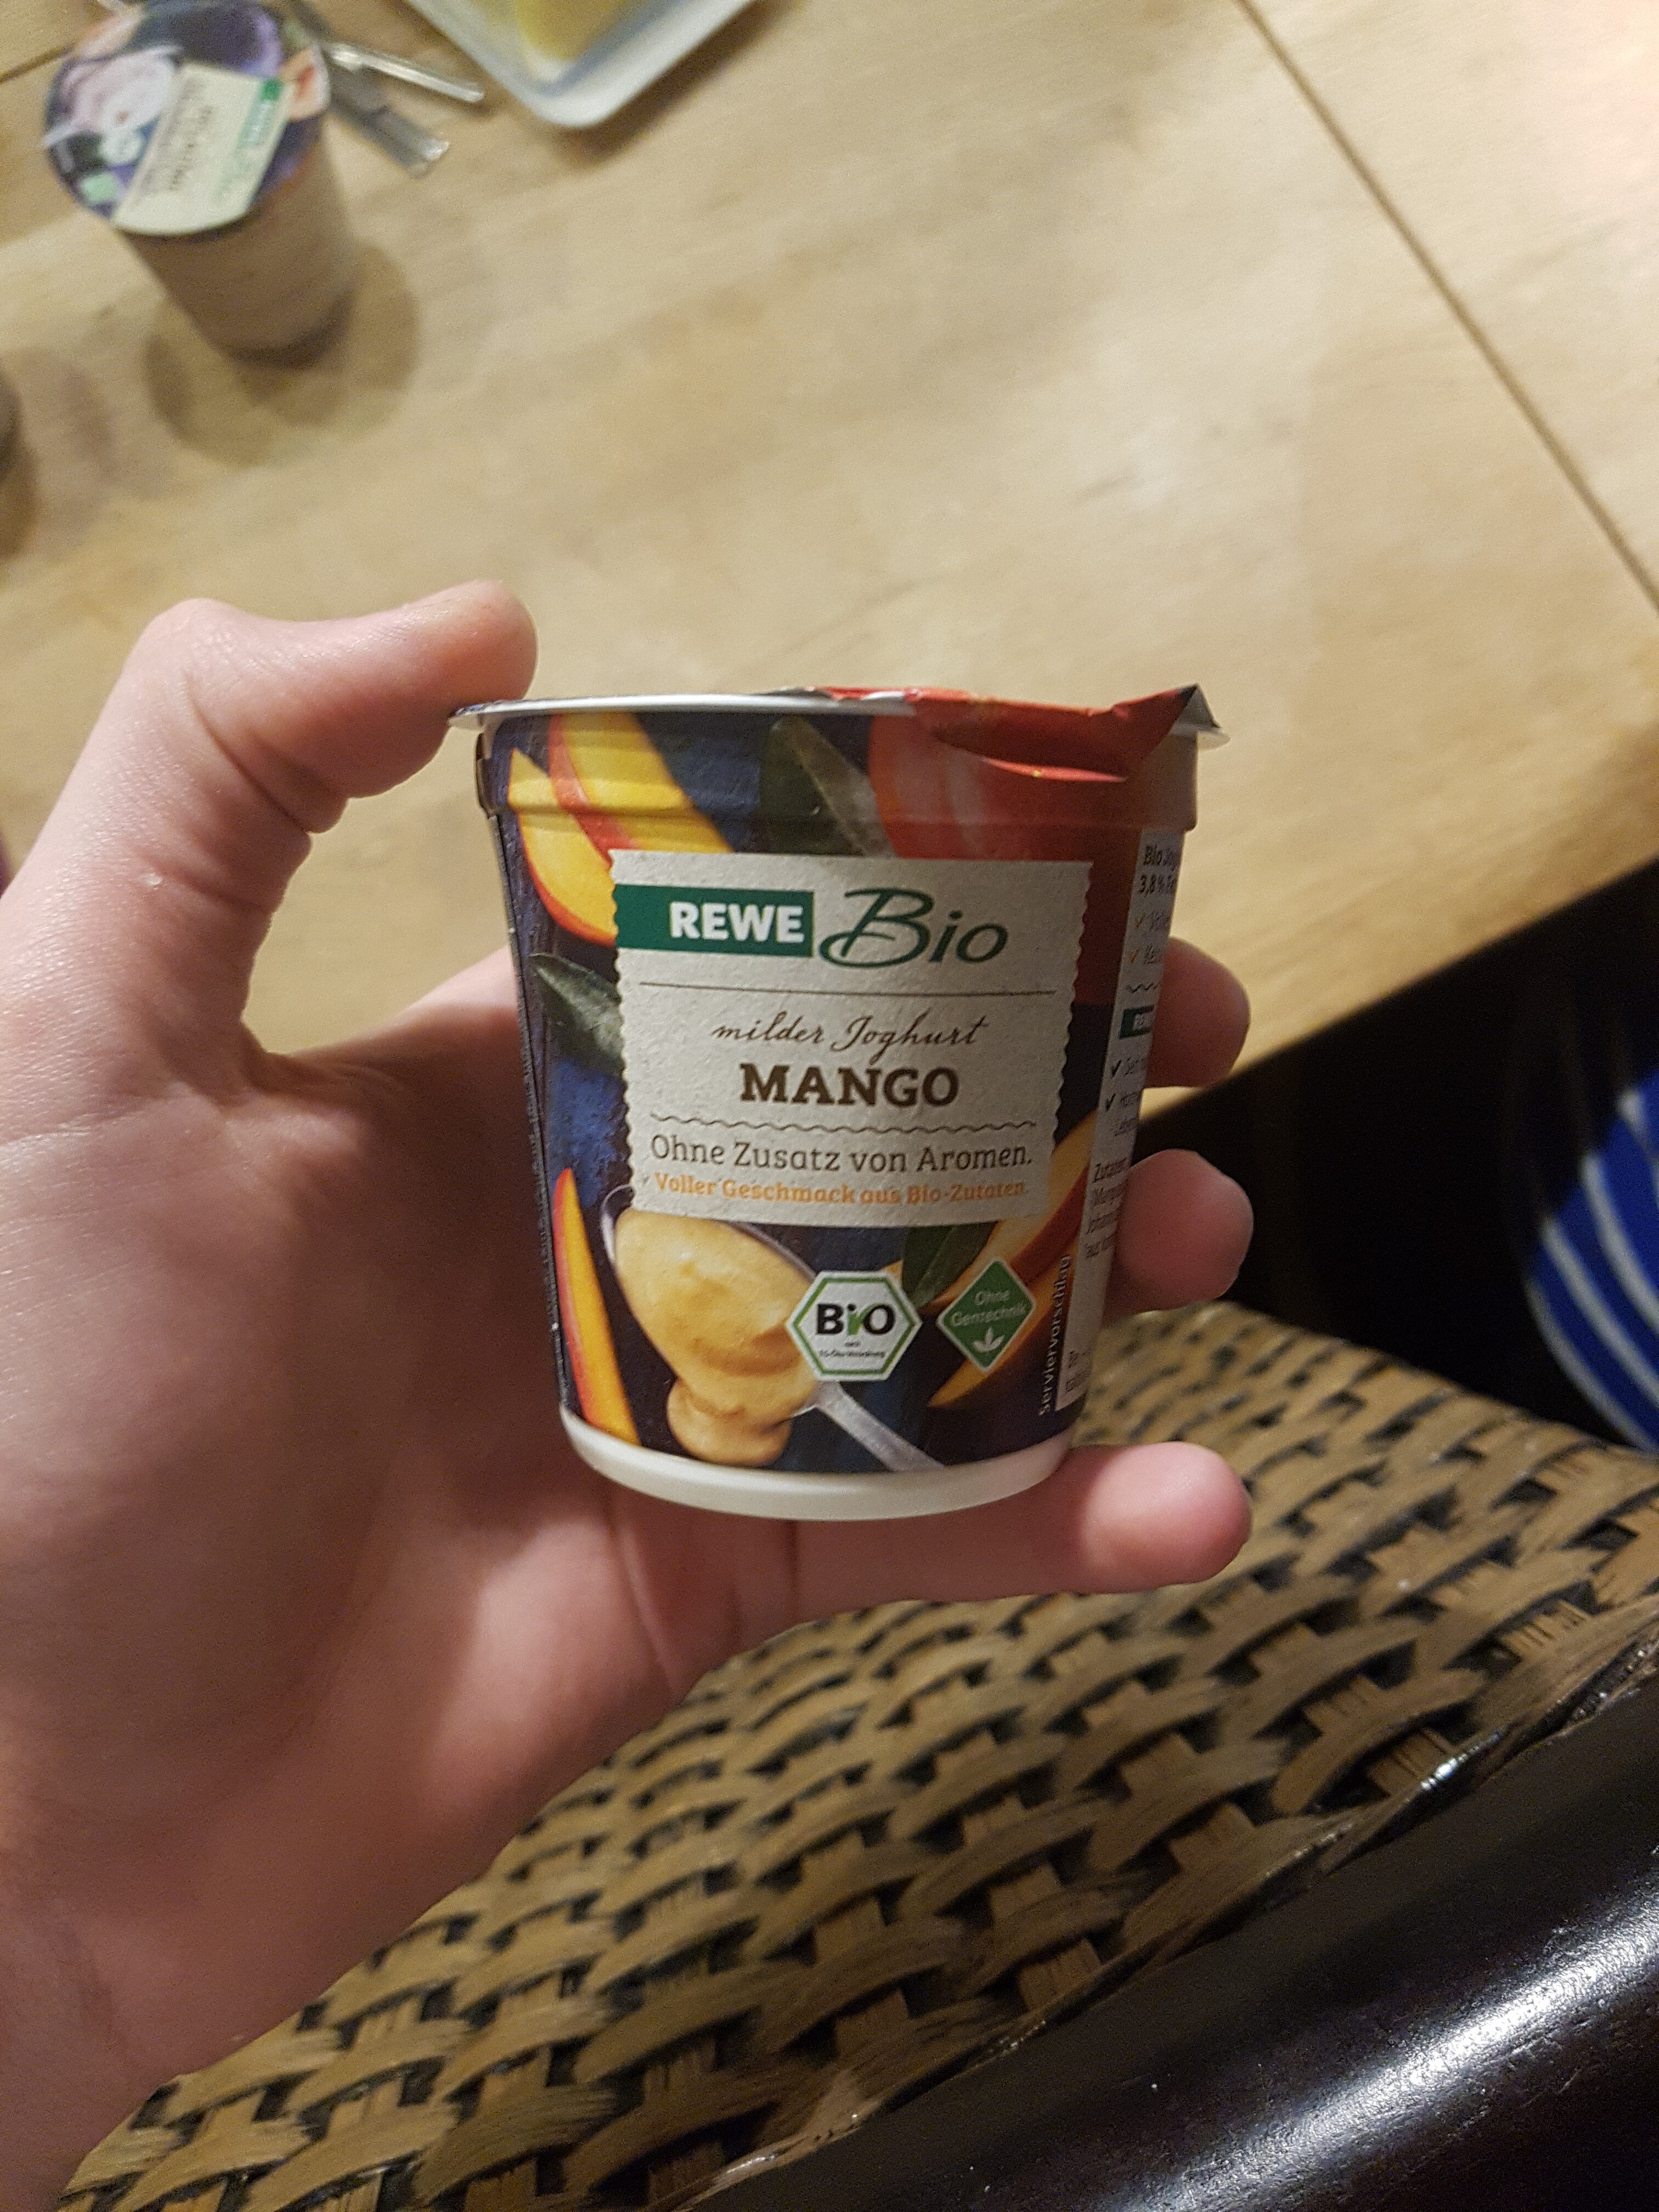 milder Joghurt Mango - Product